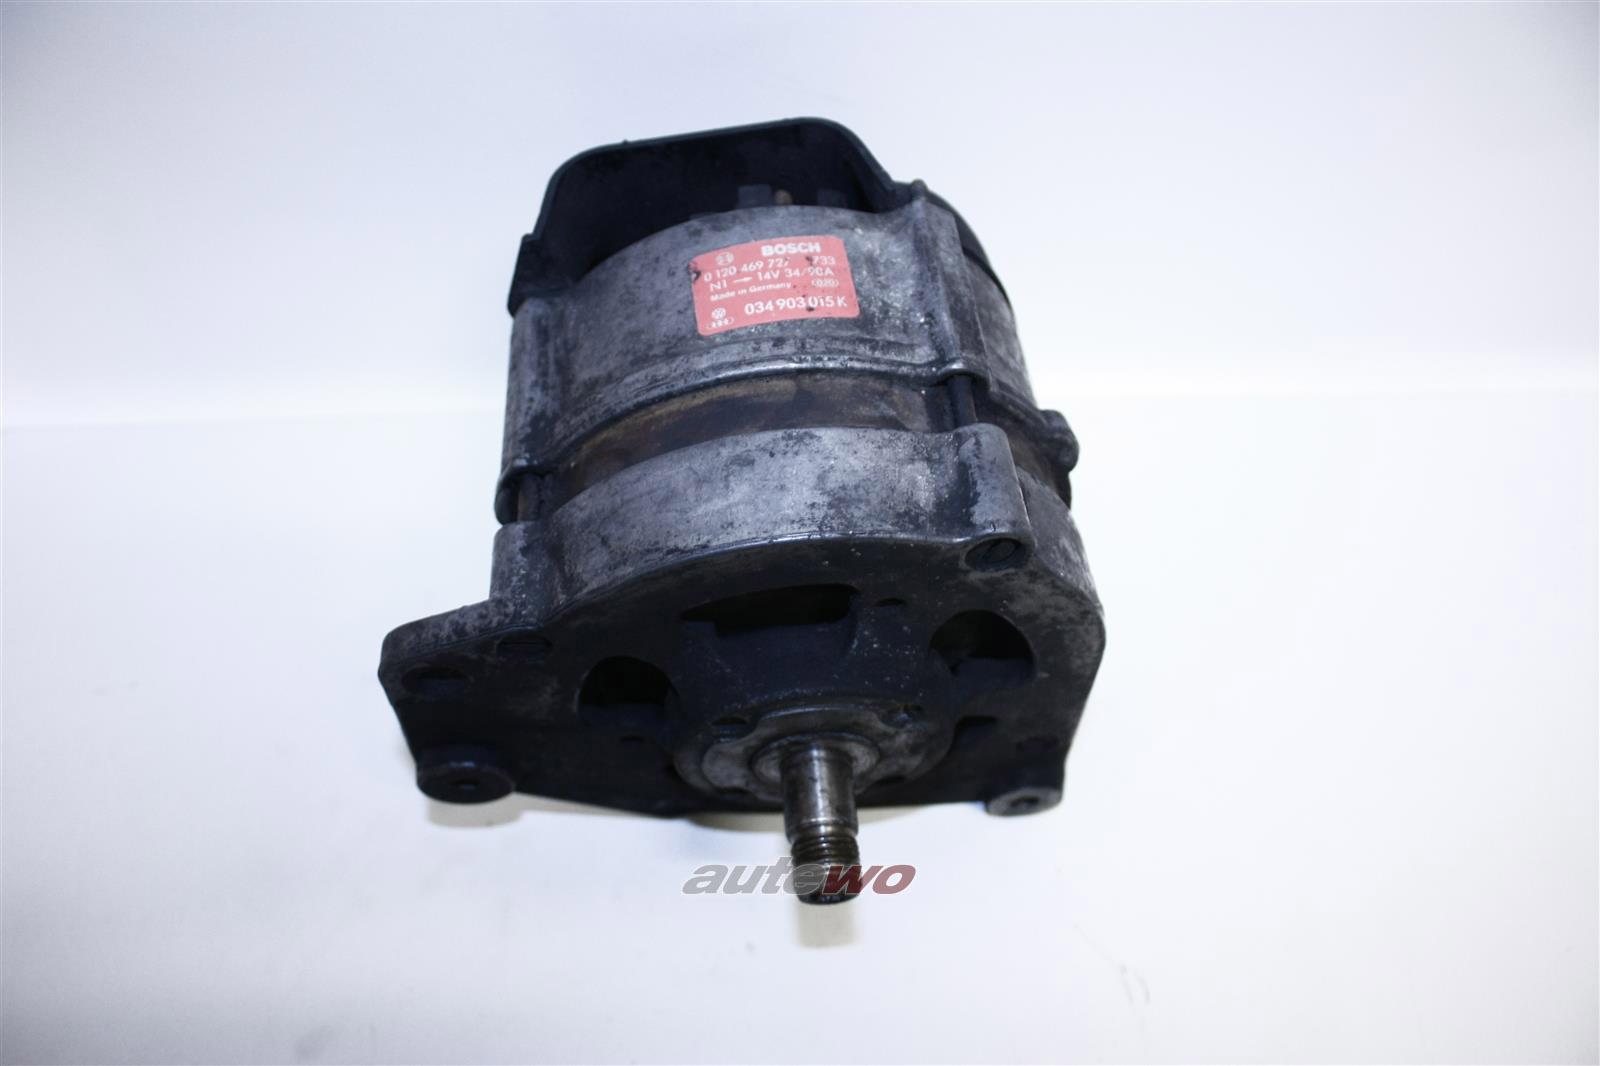 034903015K Bosch 0120469727 Audi/VW 100/200 Typ 44 2.2/2.3l Lichtmaschine 90A